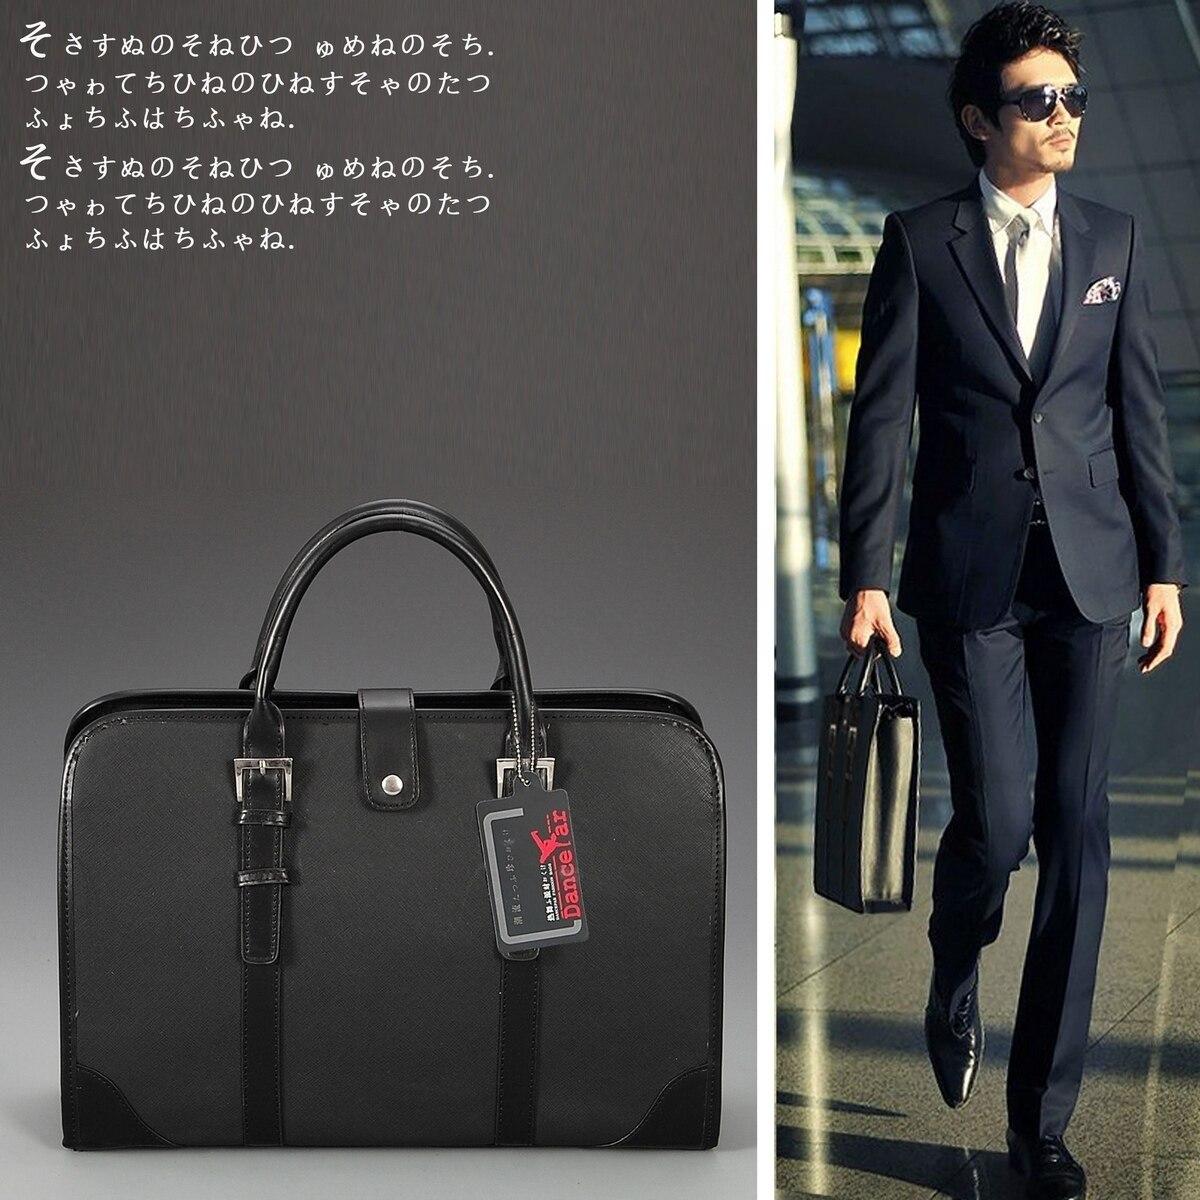 Office Bag For Man | BagsXpress